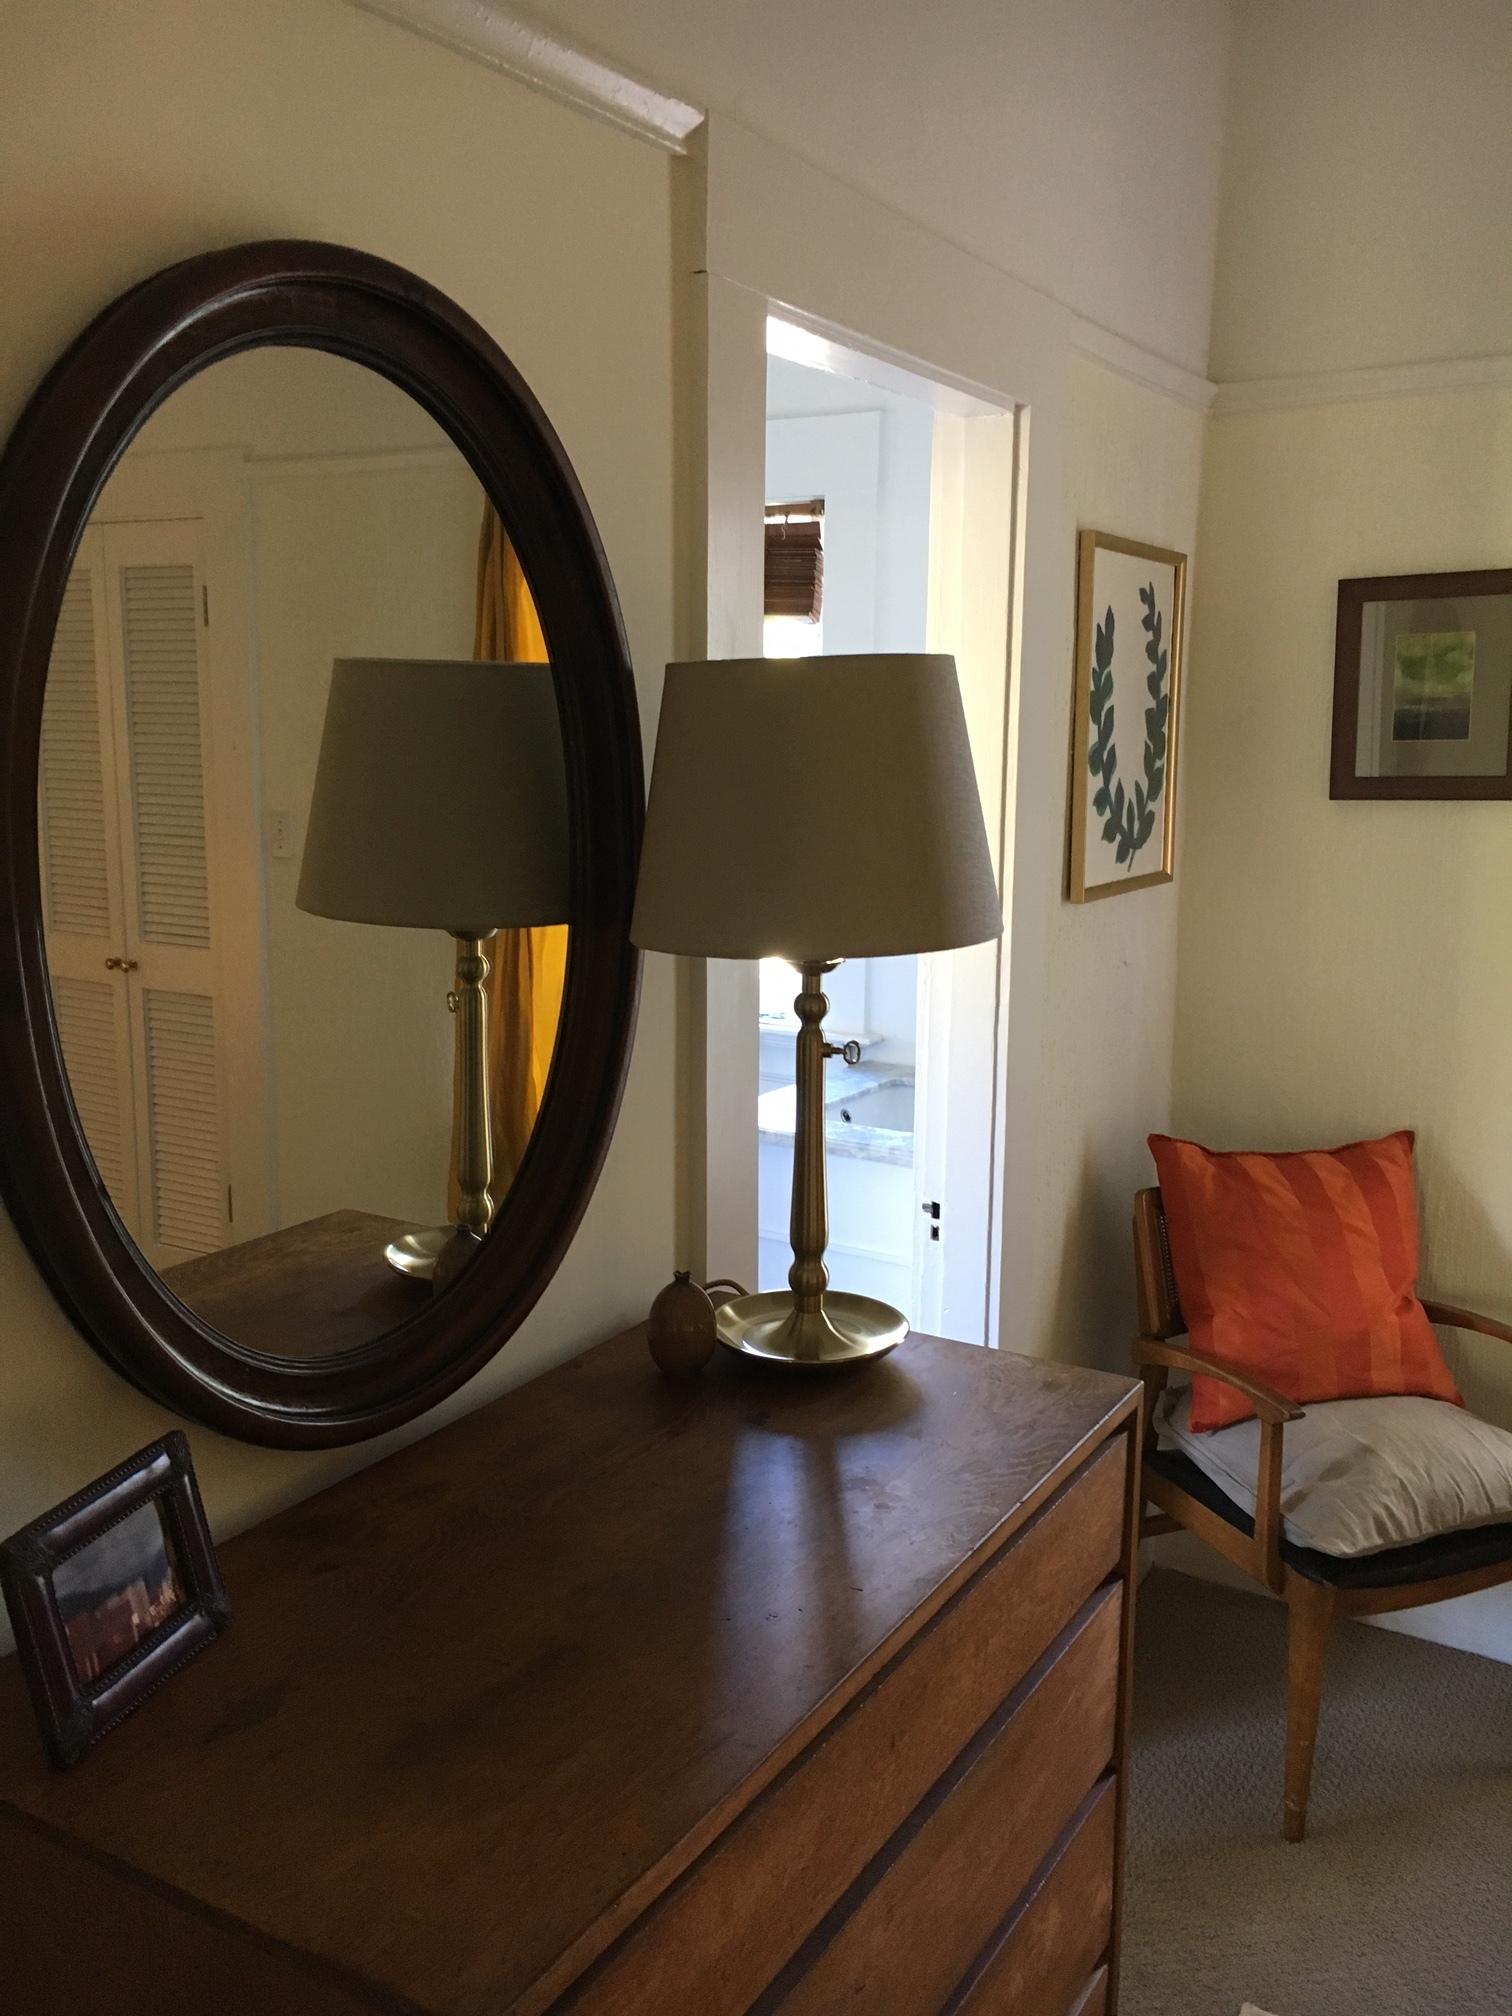 backbedroom-mirror.jpeg